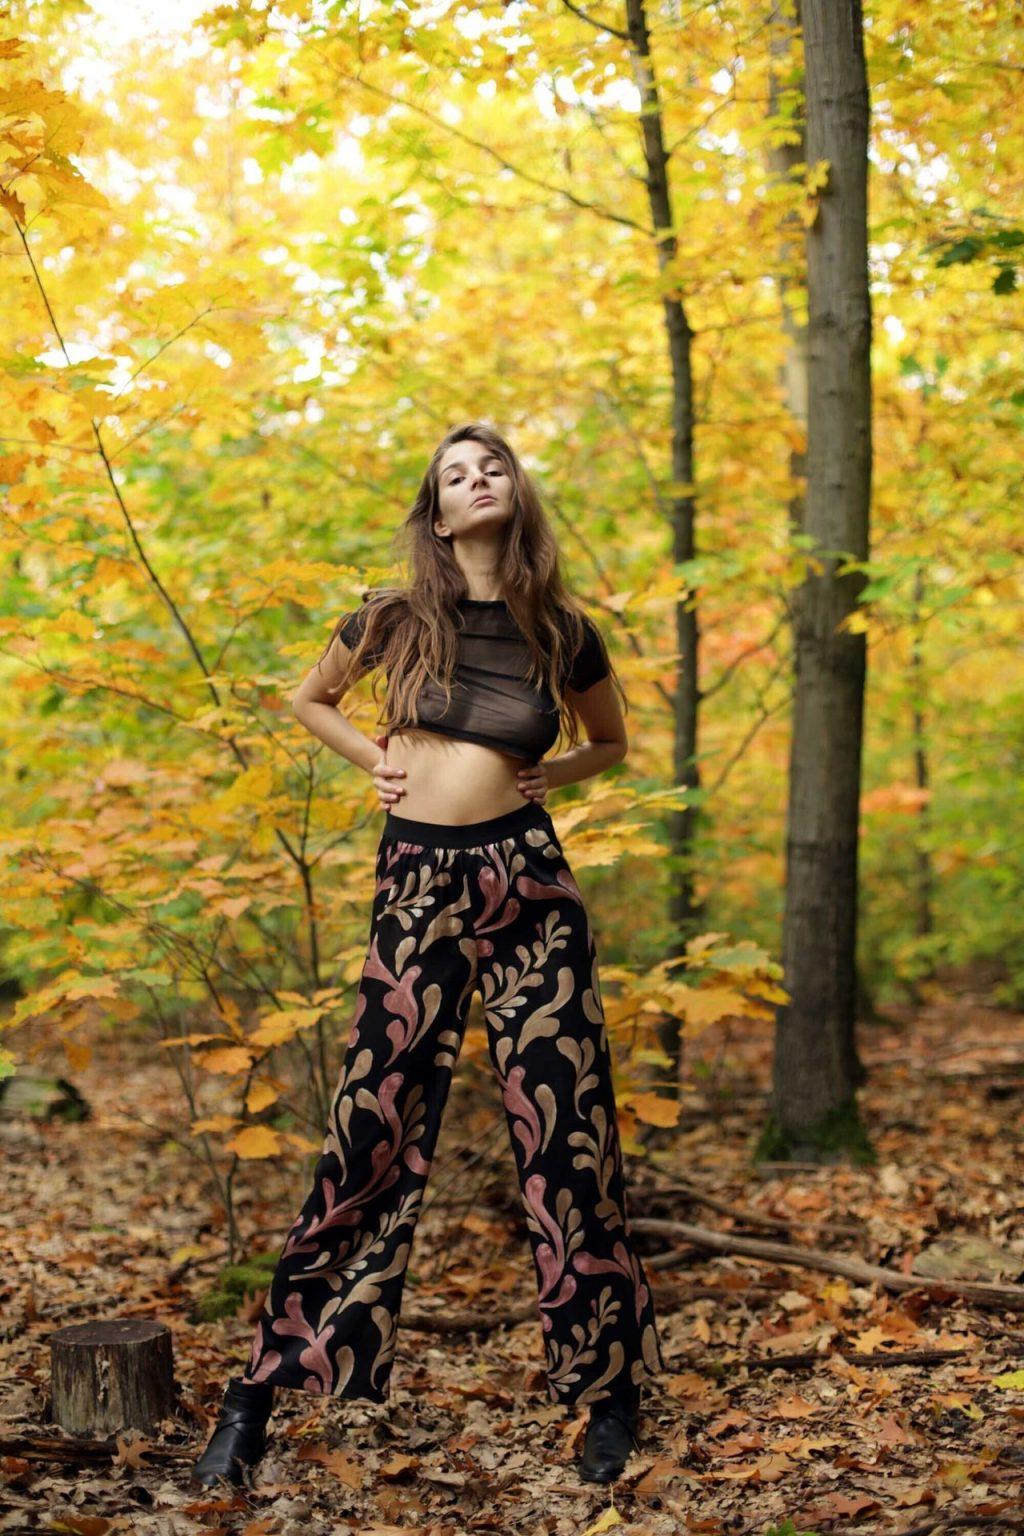 Lina-Lorenza-Nude-Sexy-The-Fappening-Blog-com-10-1024x1536